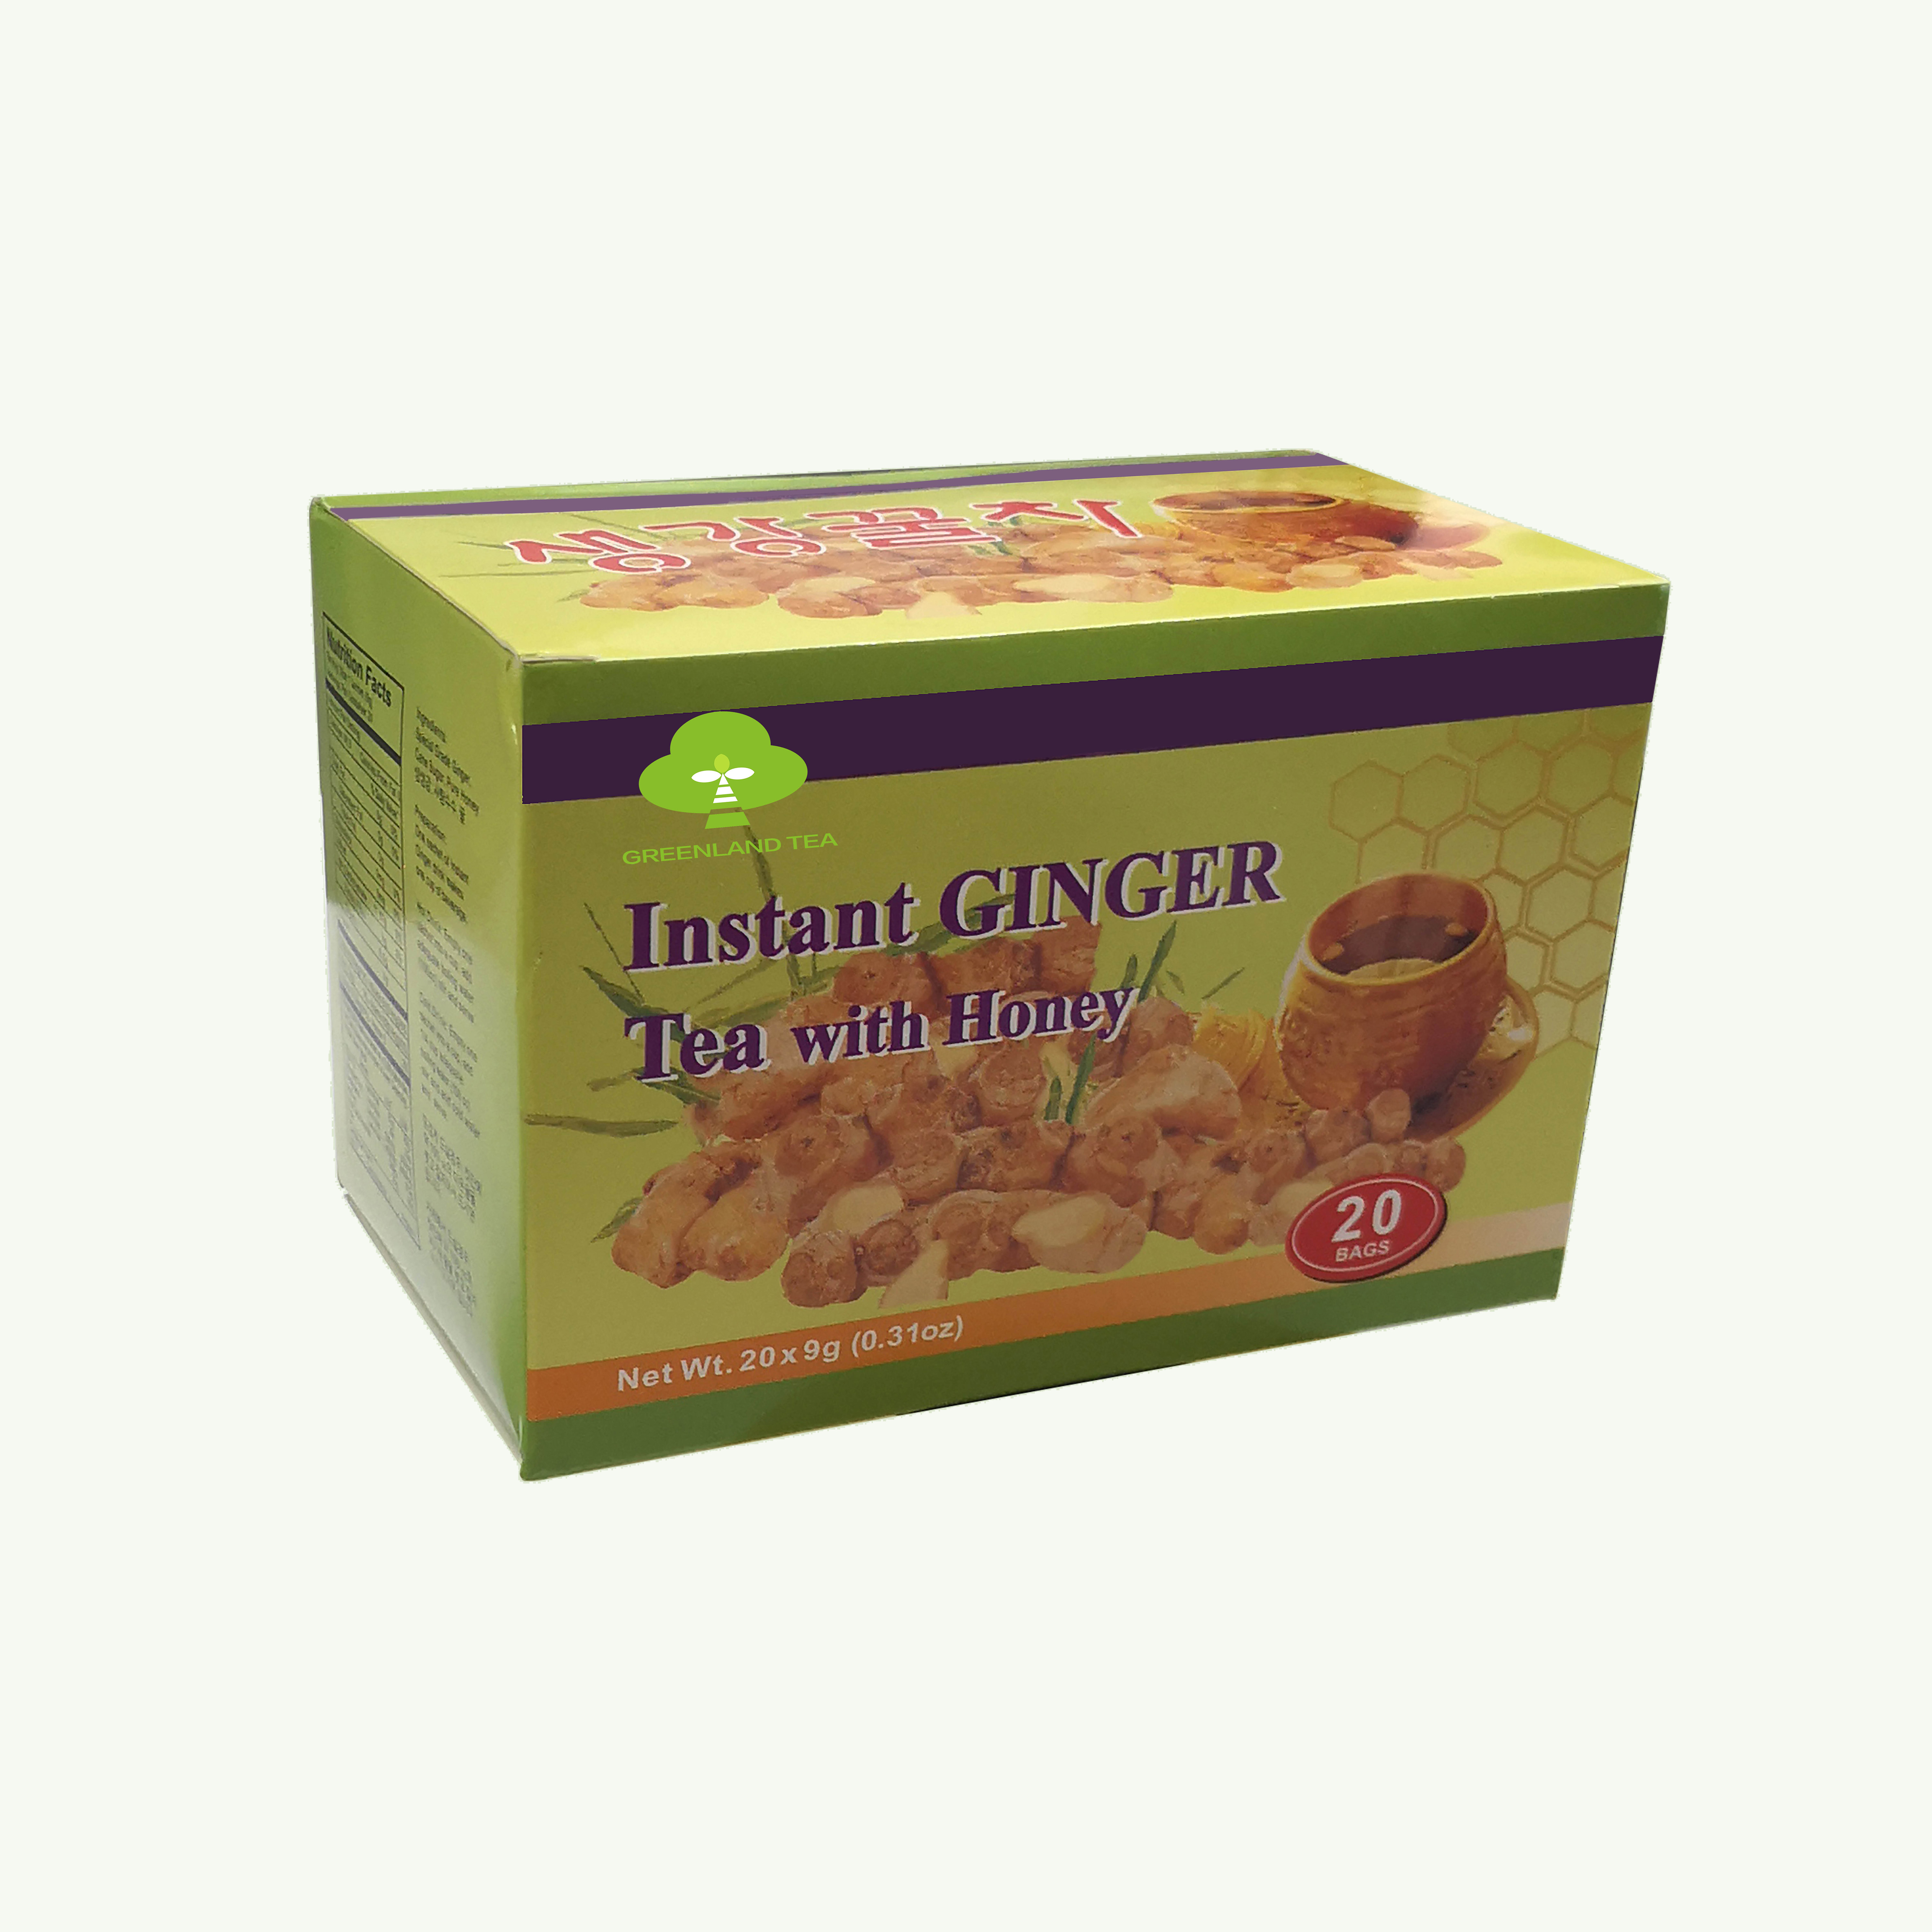 Good taste health chinese ginger tea with lemon instant drink - 4uTea | 4uTea.com